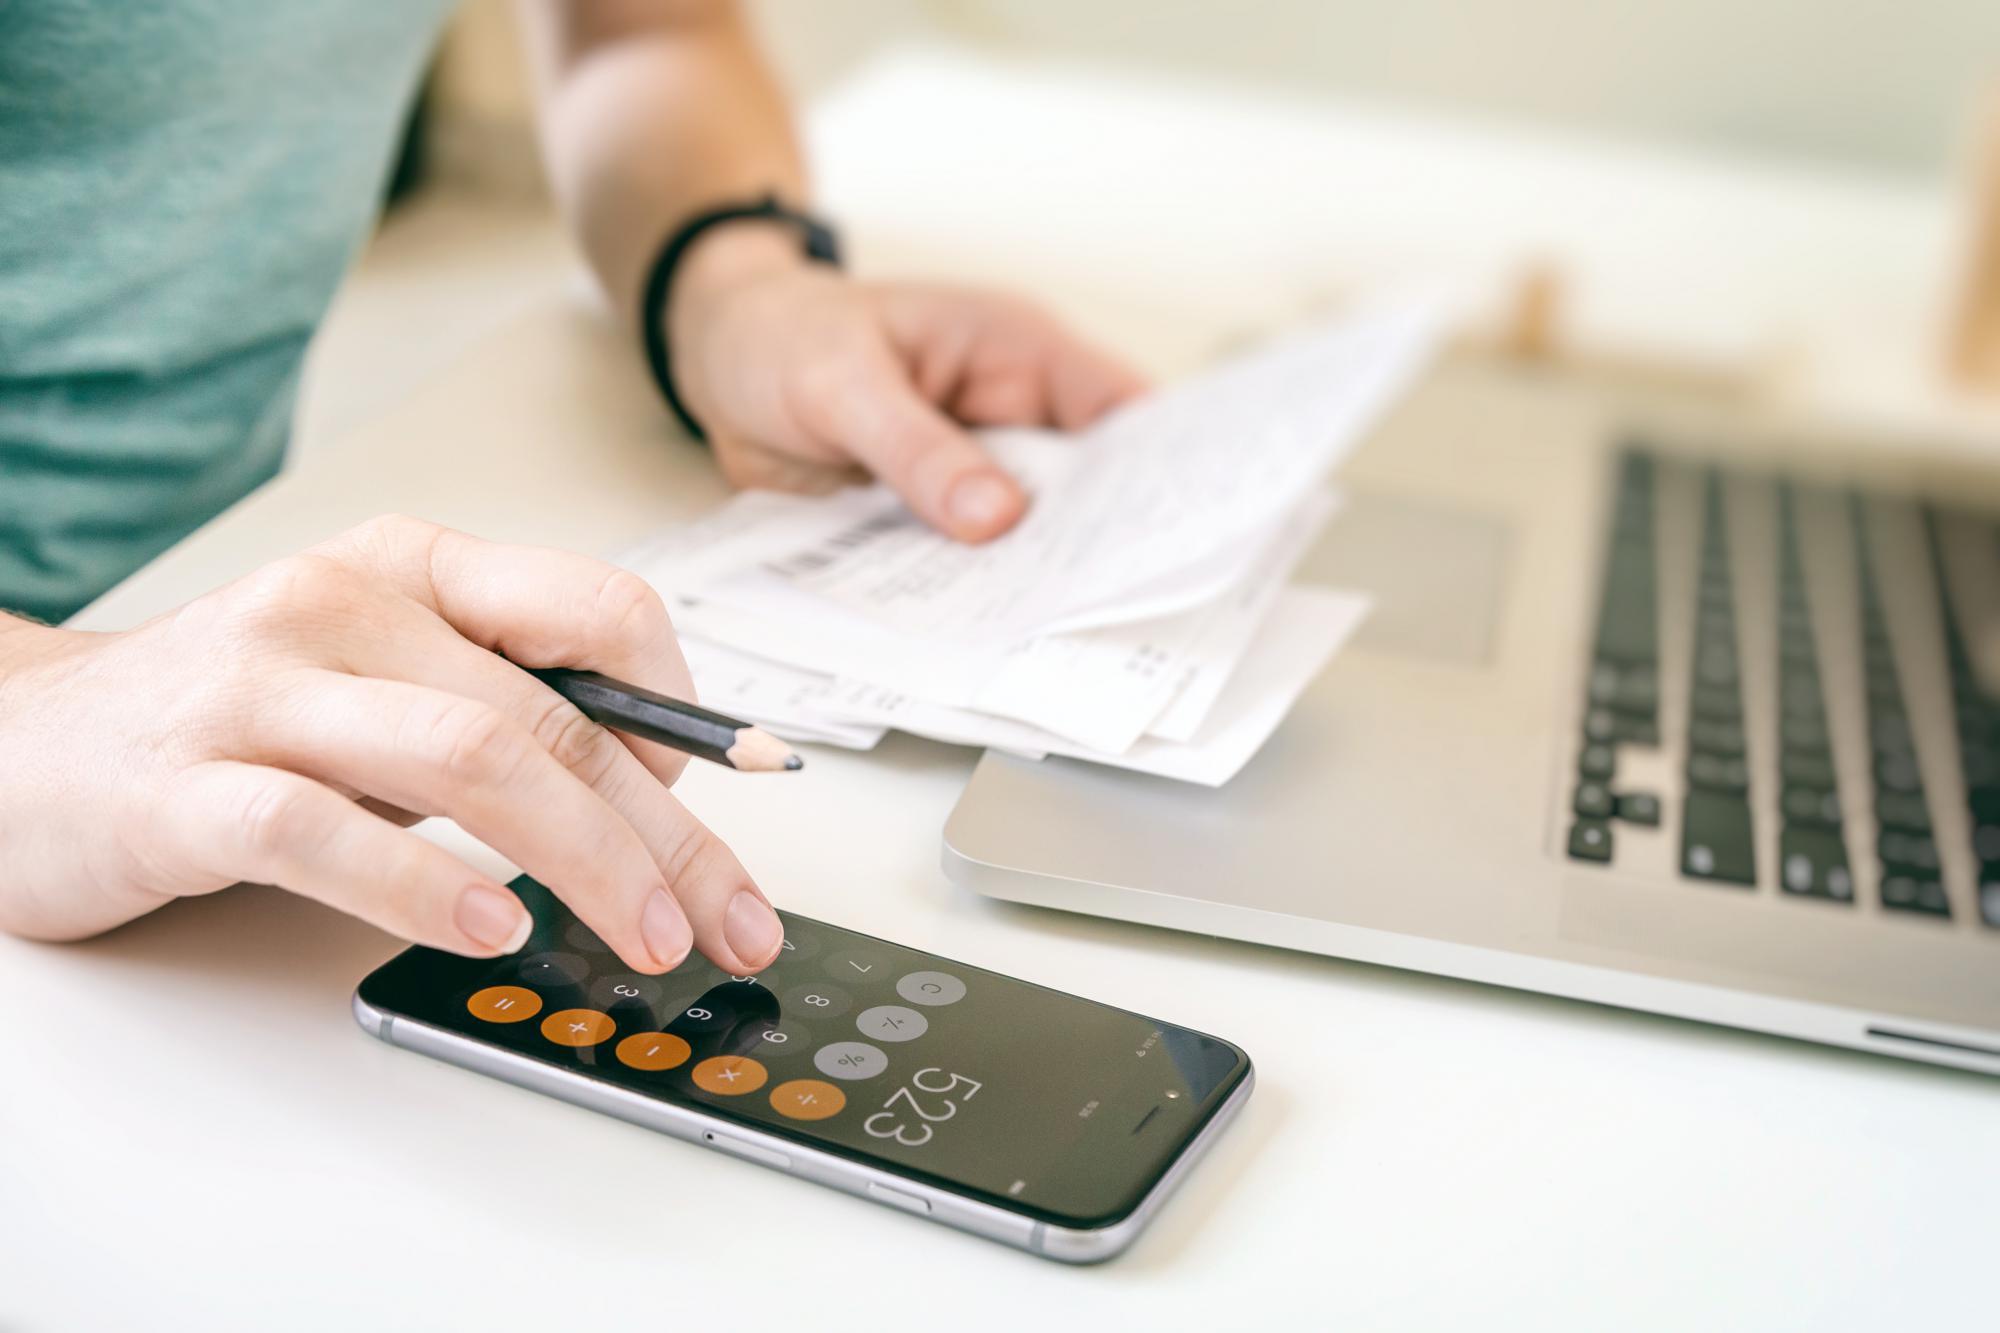 ФНС утвердила новые форматы по счетам-фактурам